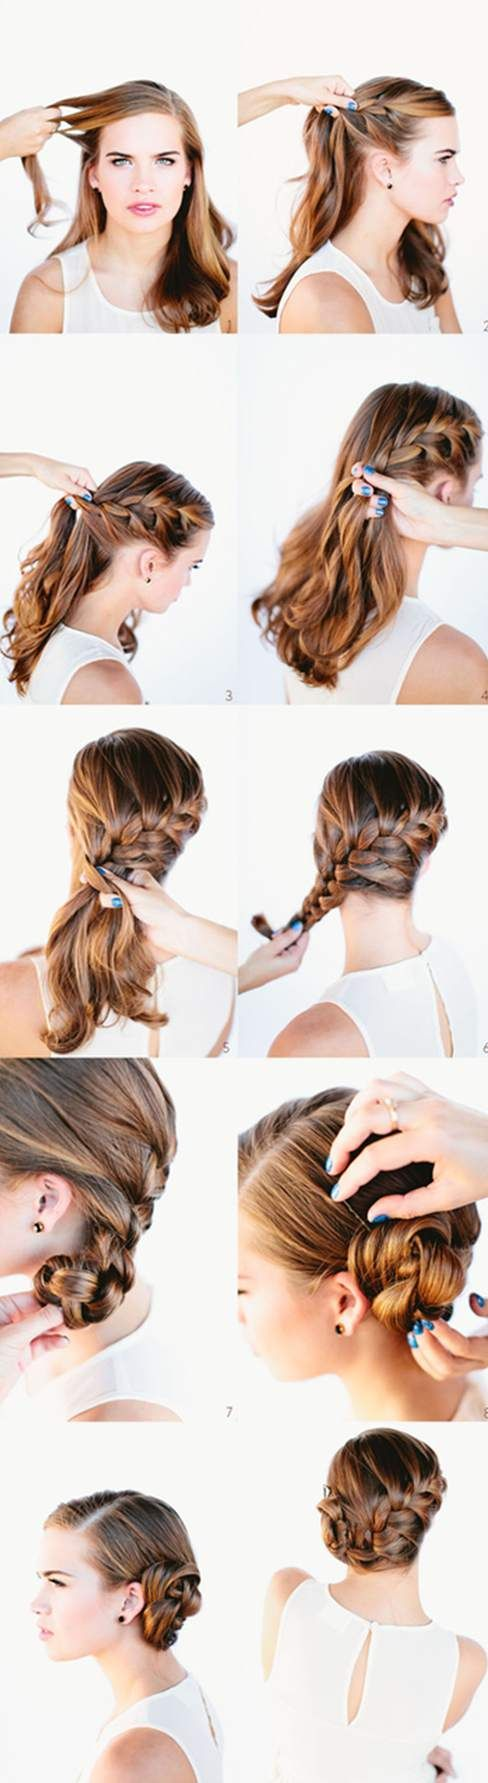 413 best medium hair images on Pinterest | Hair cuts, Hair styles ...